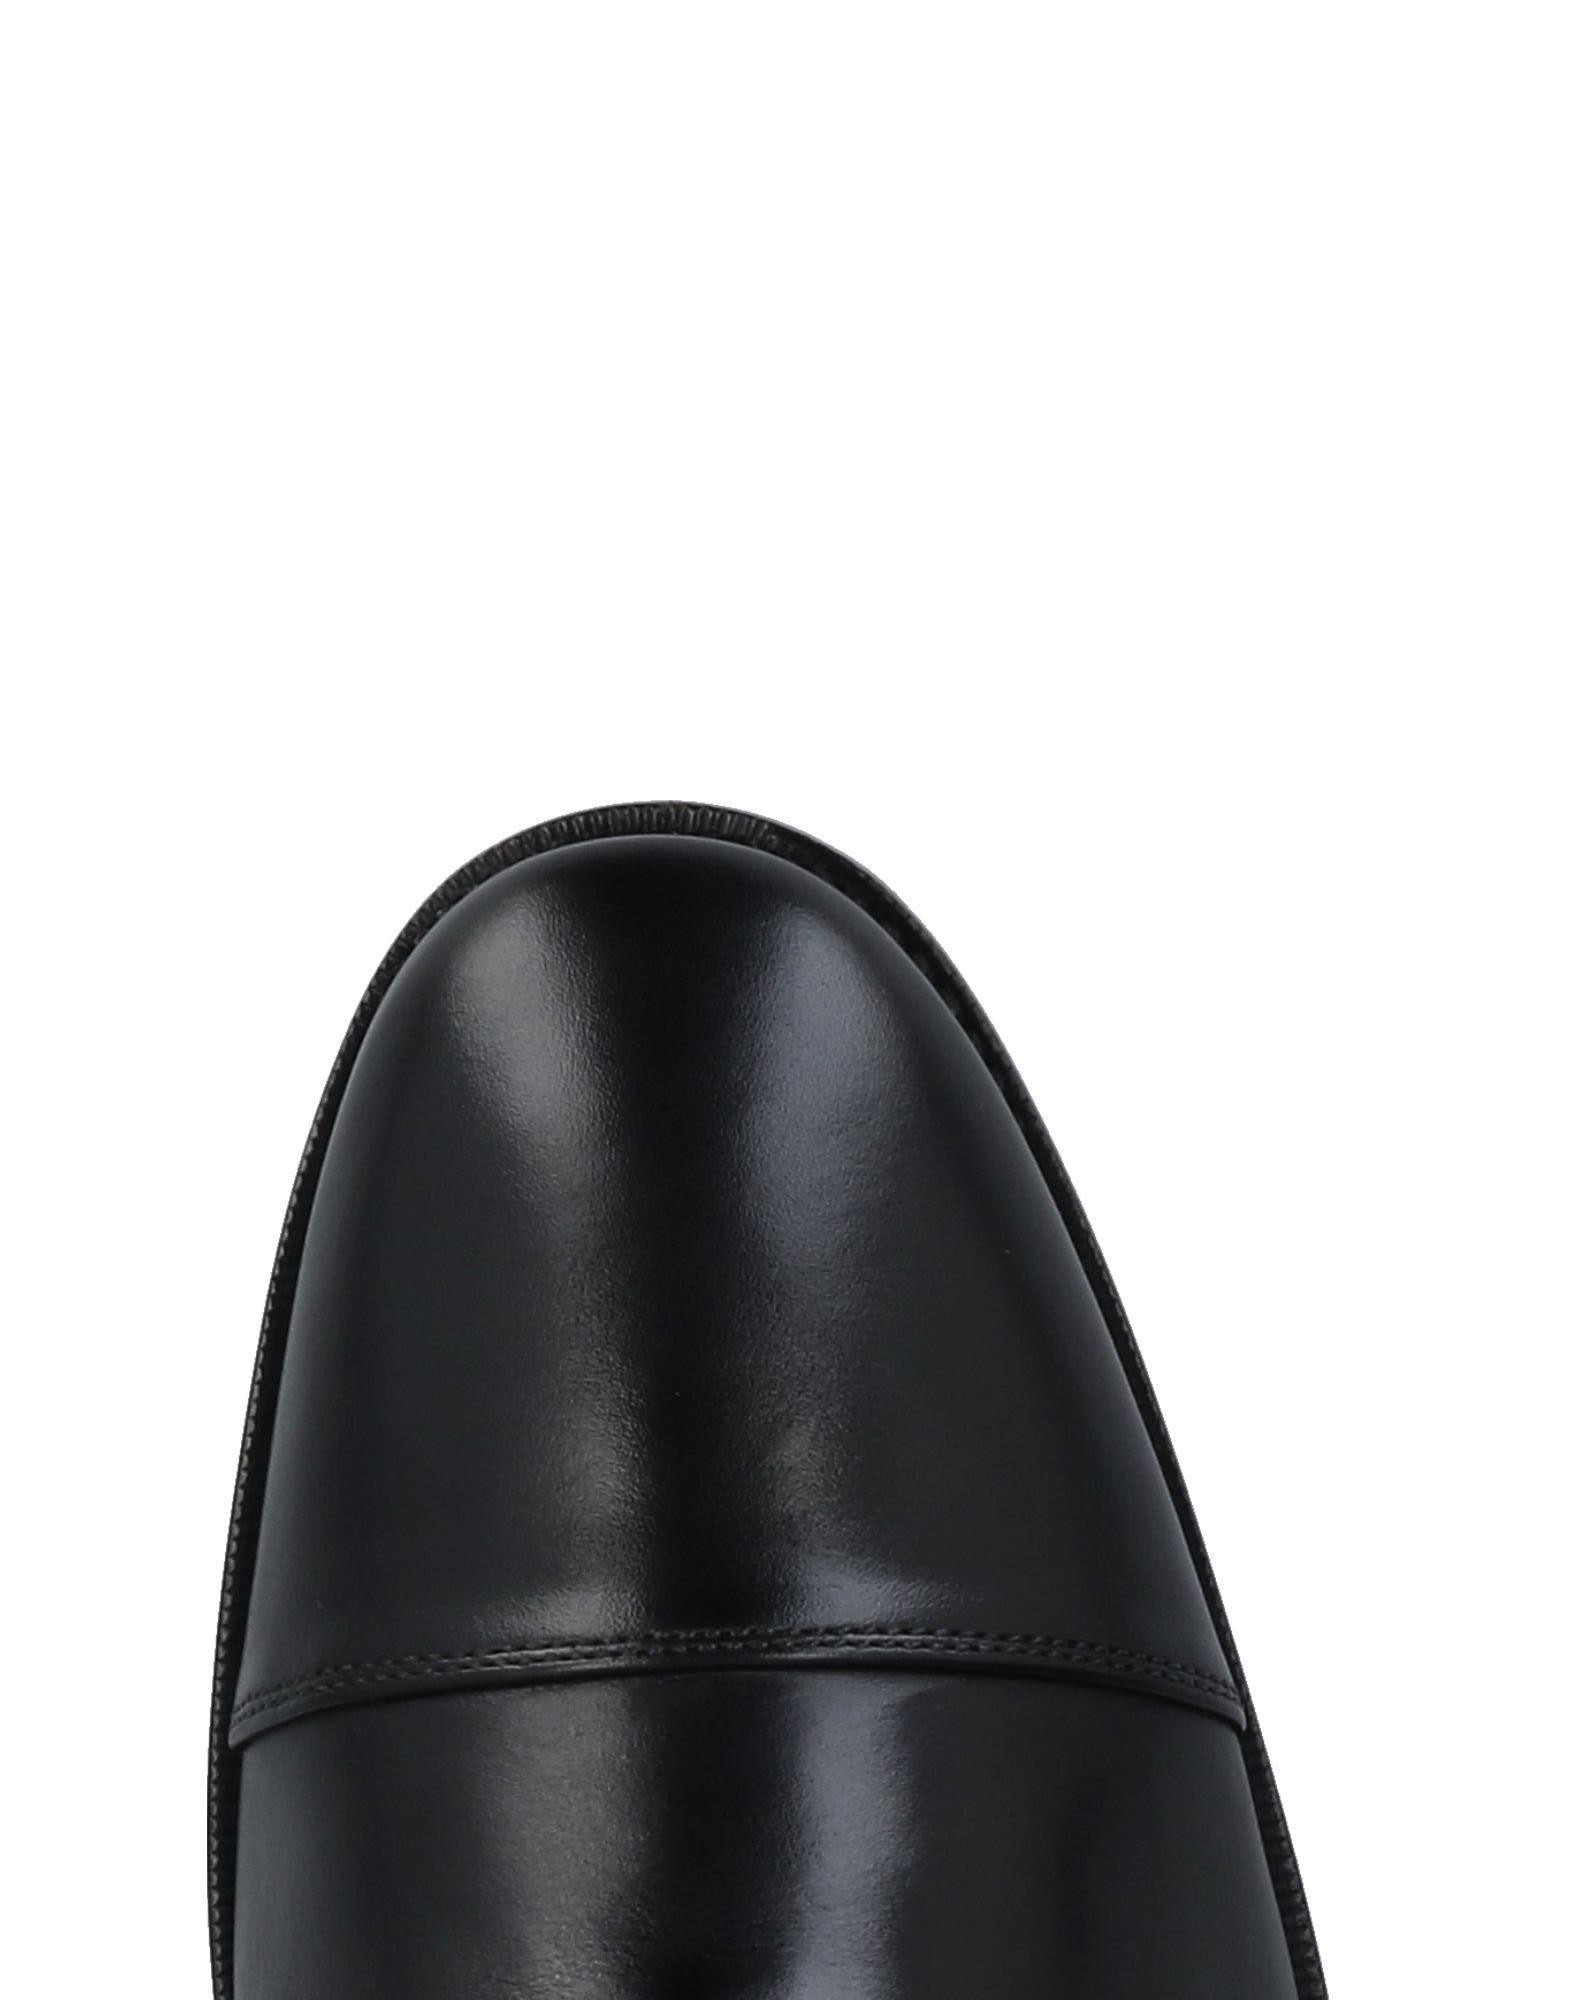 Santoni Schnürschuhe Herren  Schuhe 11478548BJ Gute Qualität beliebte Schuhe  1654a4